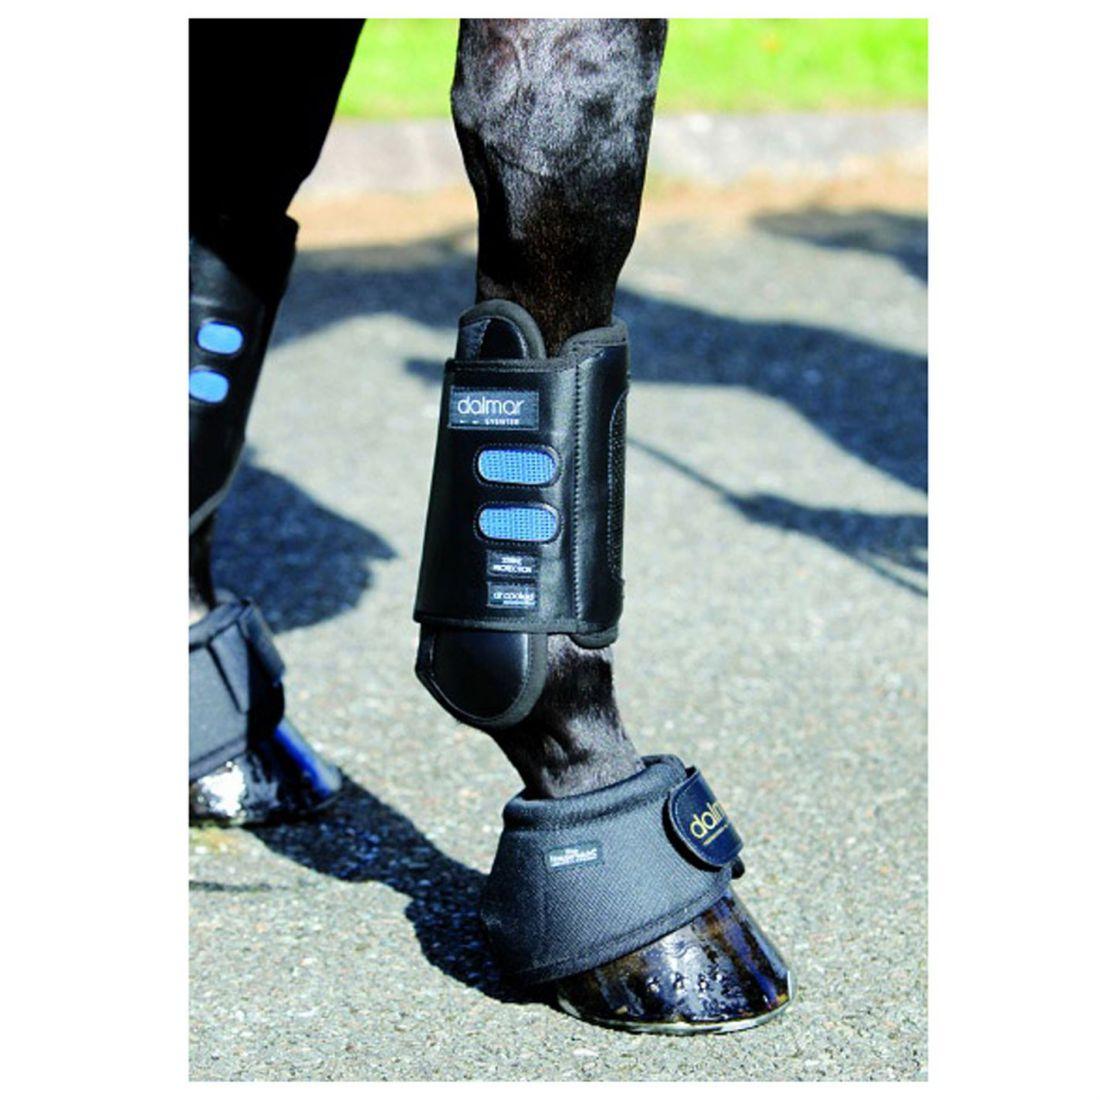 Dalmar Eventer Front Stiefel Unisex Horse Legwear Warm